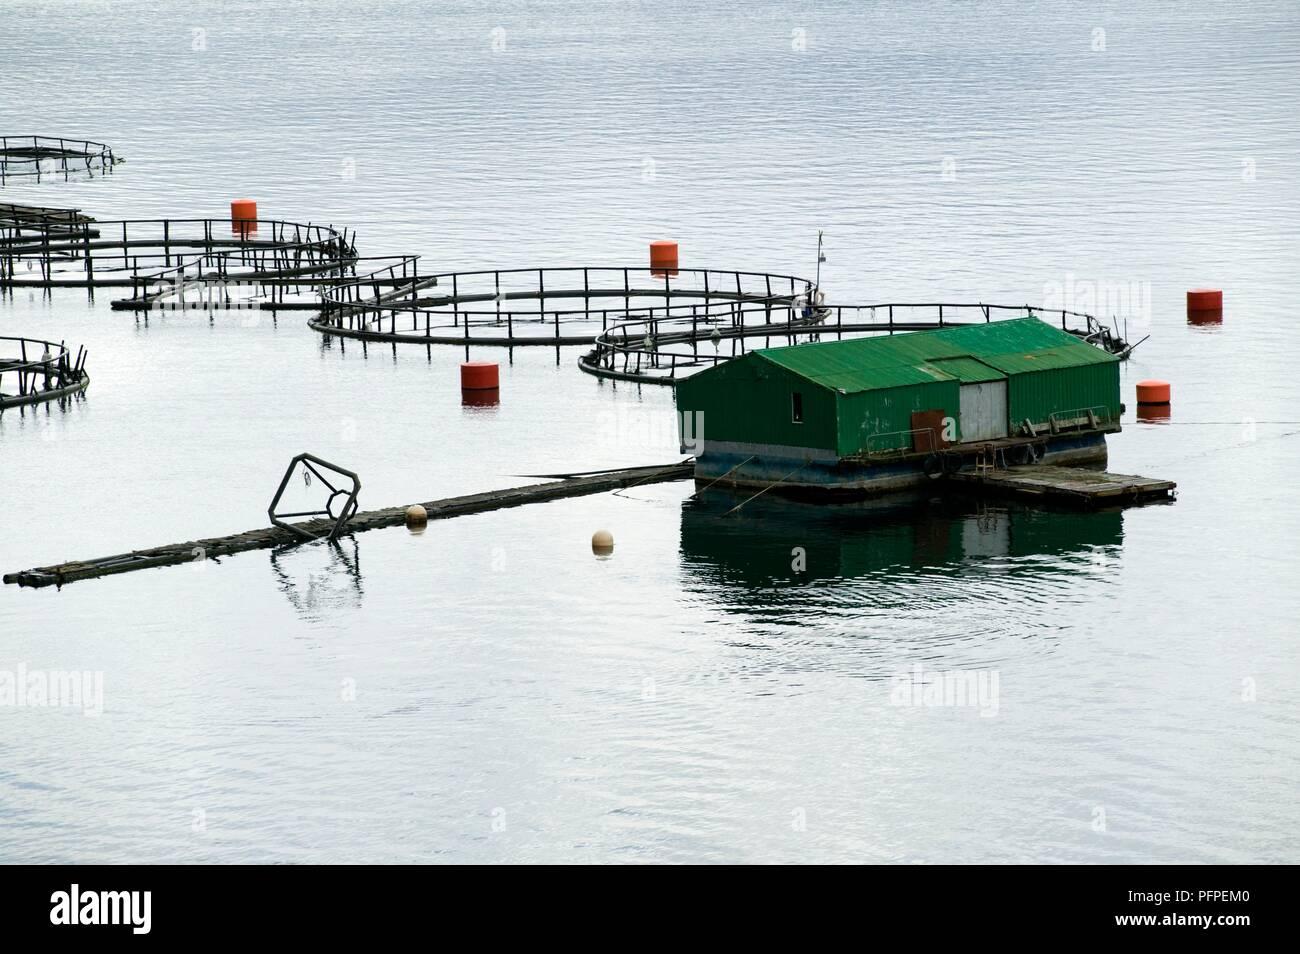 Chile, Patagonia, near Puerto Puyuhuapi town, fish farm in Bahia Dorita (Dorita Bay) - Stock Image